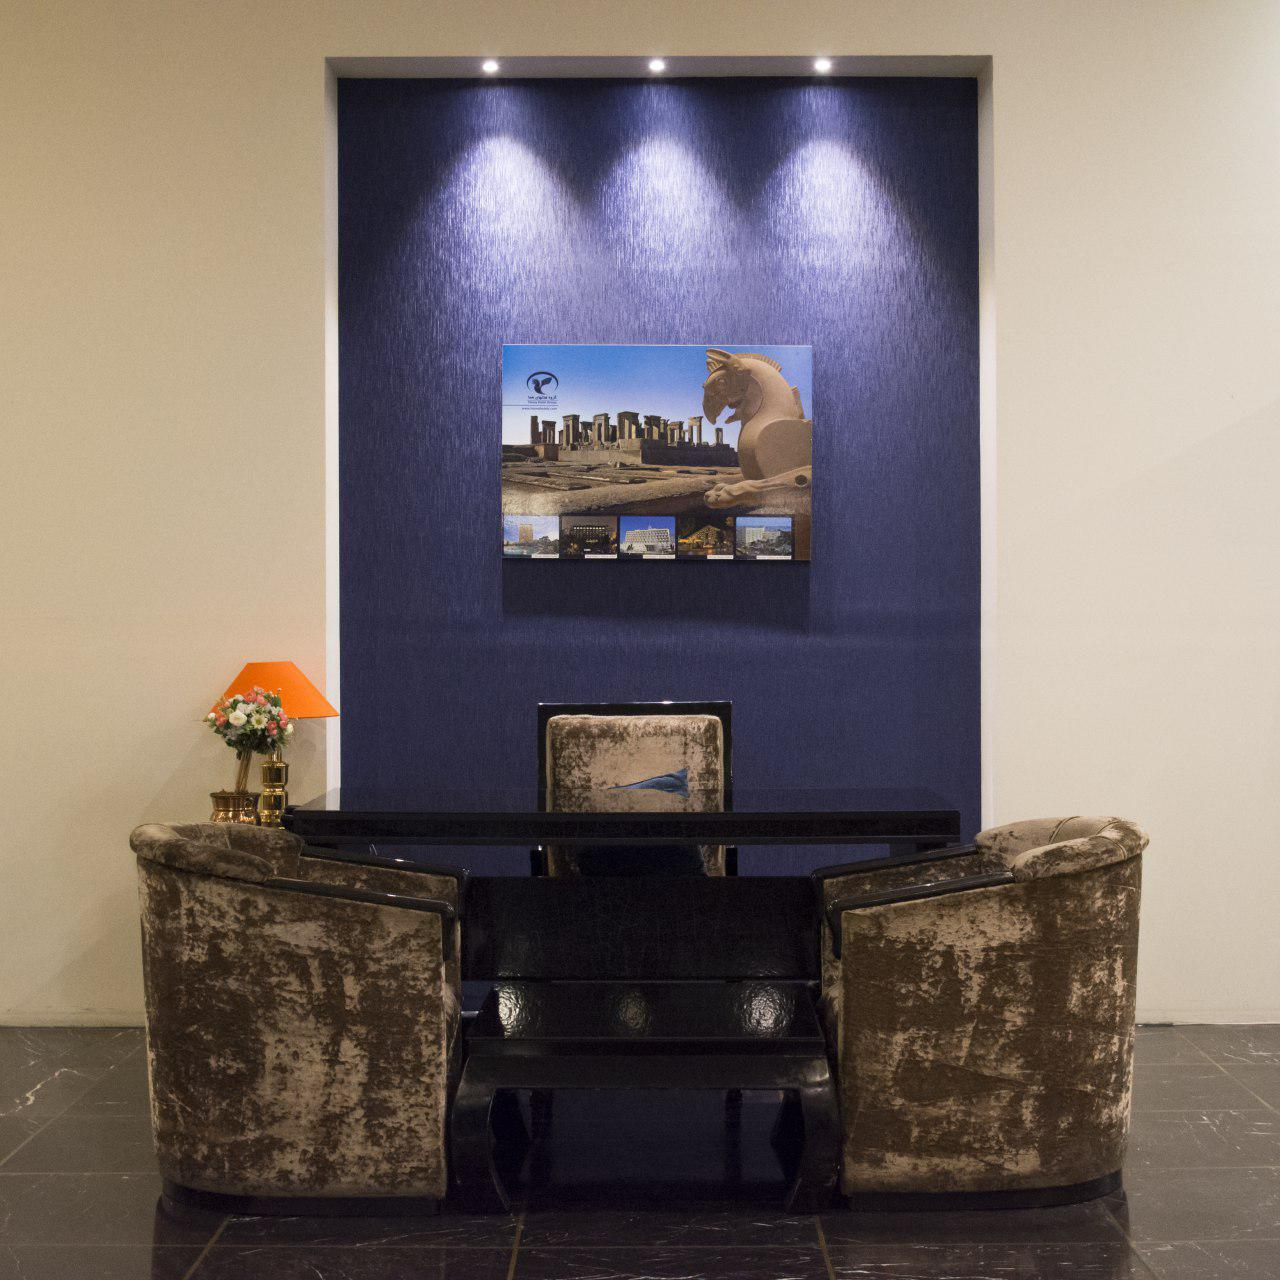 Inside decoration of Homa hotel